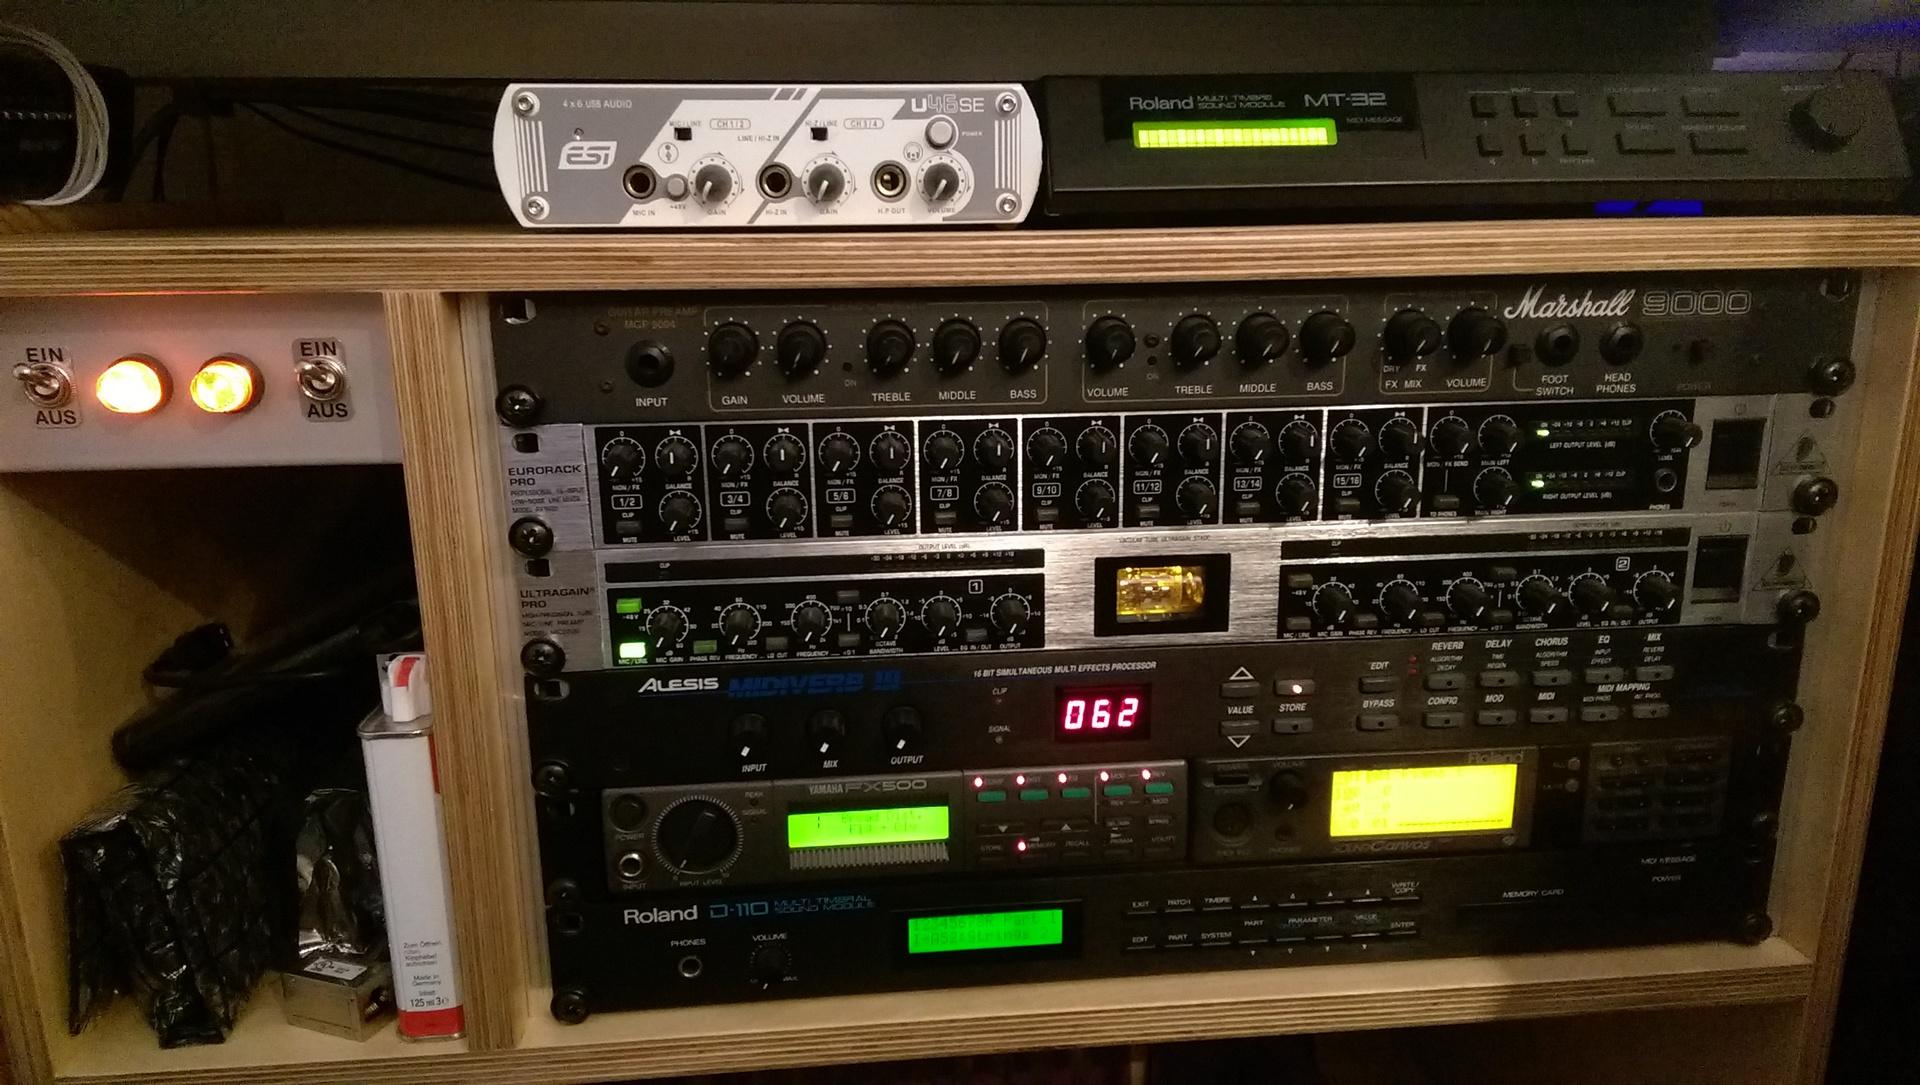 synhies und studioequipment stereo hifi bildergalerie. Black Bedroom Furniture Sets. Home Design Ideas